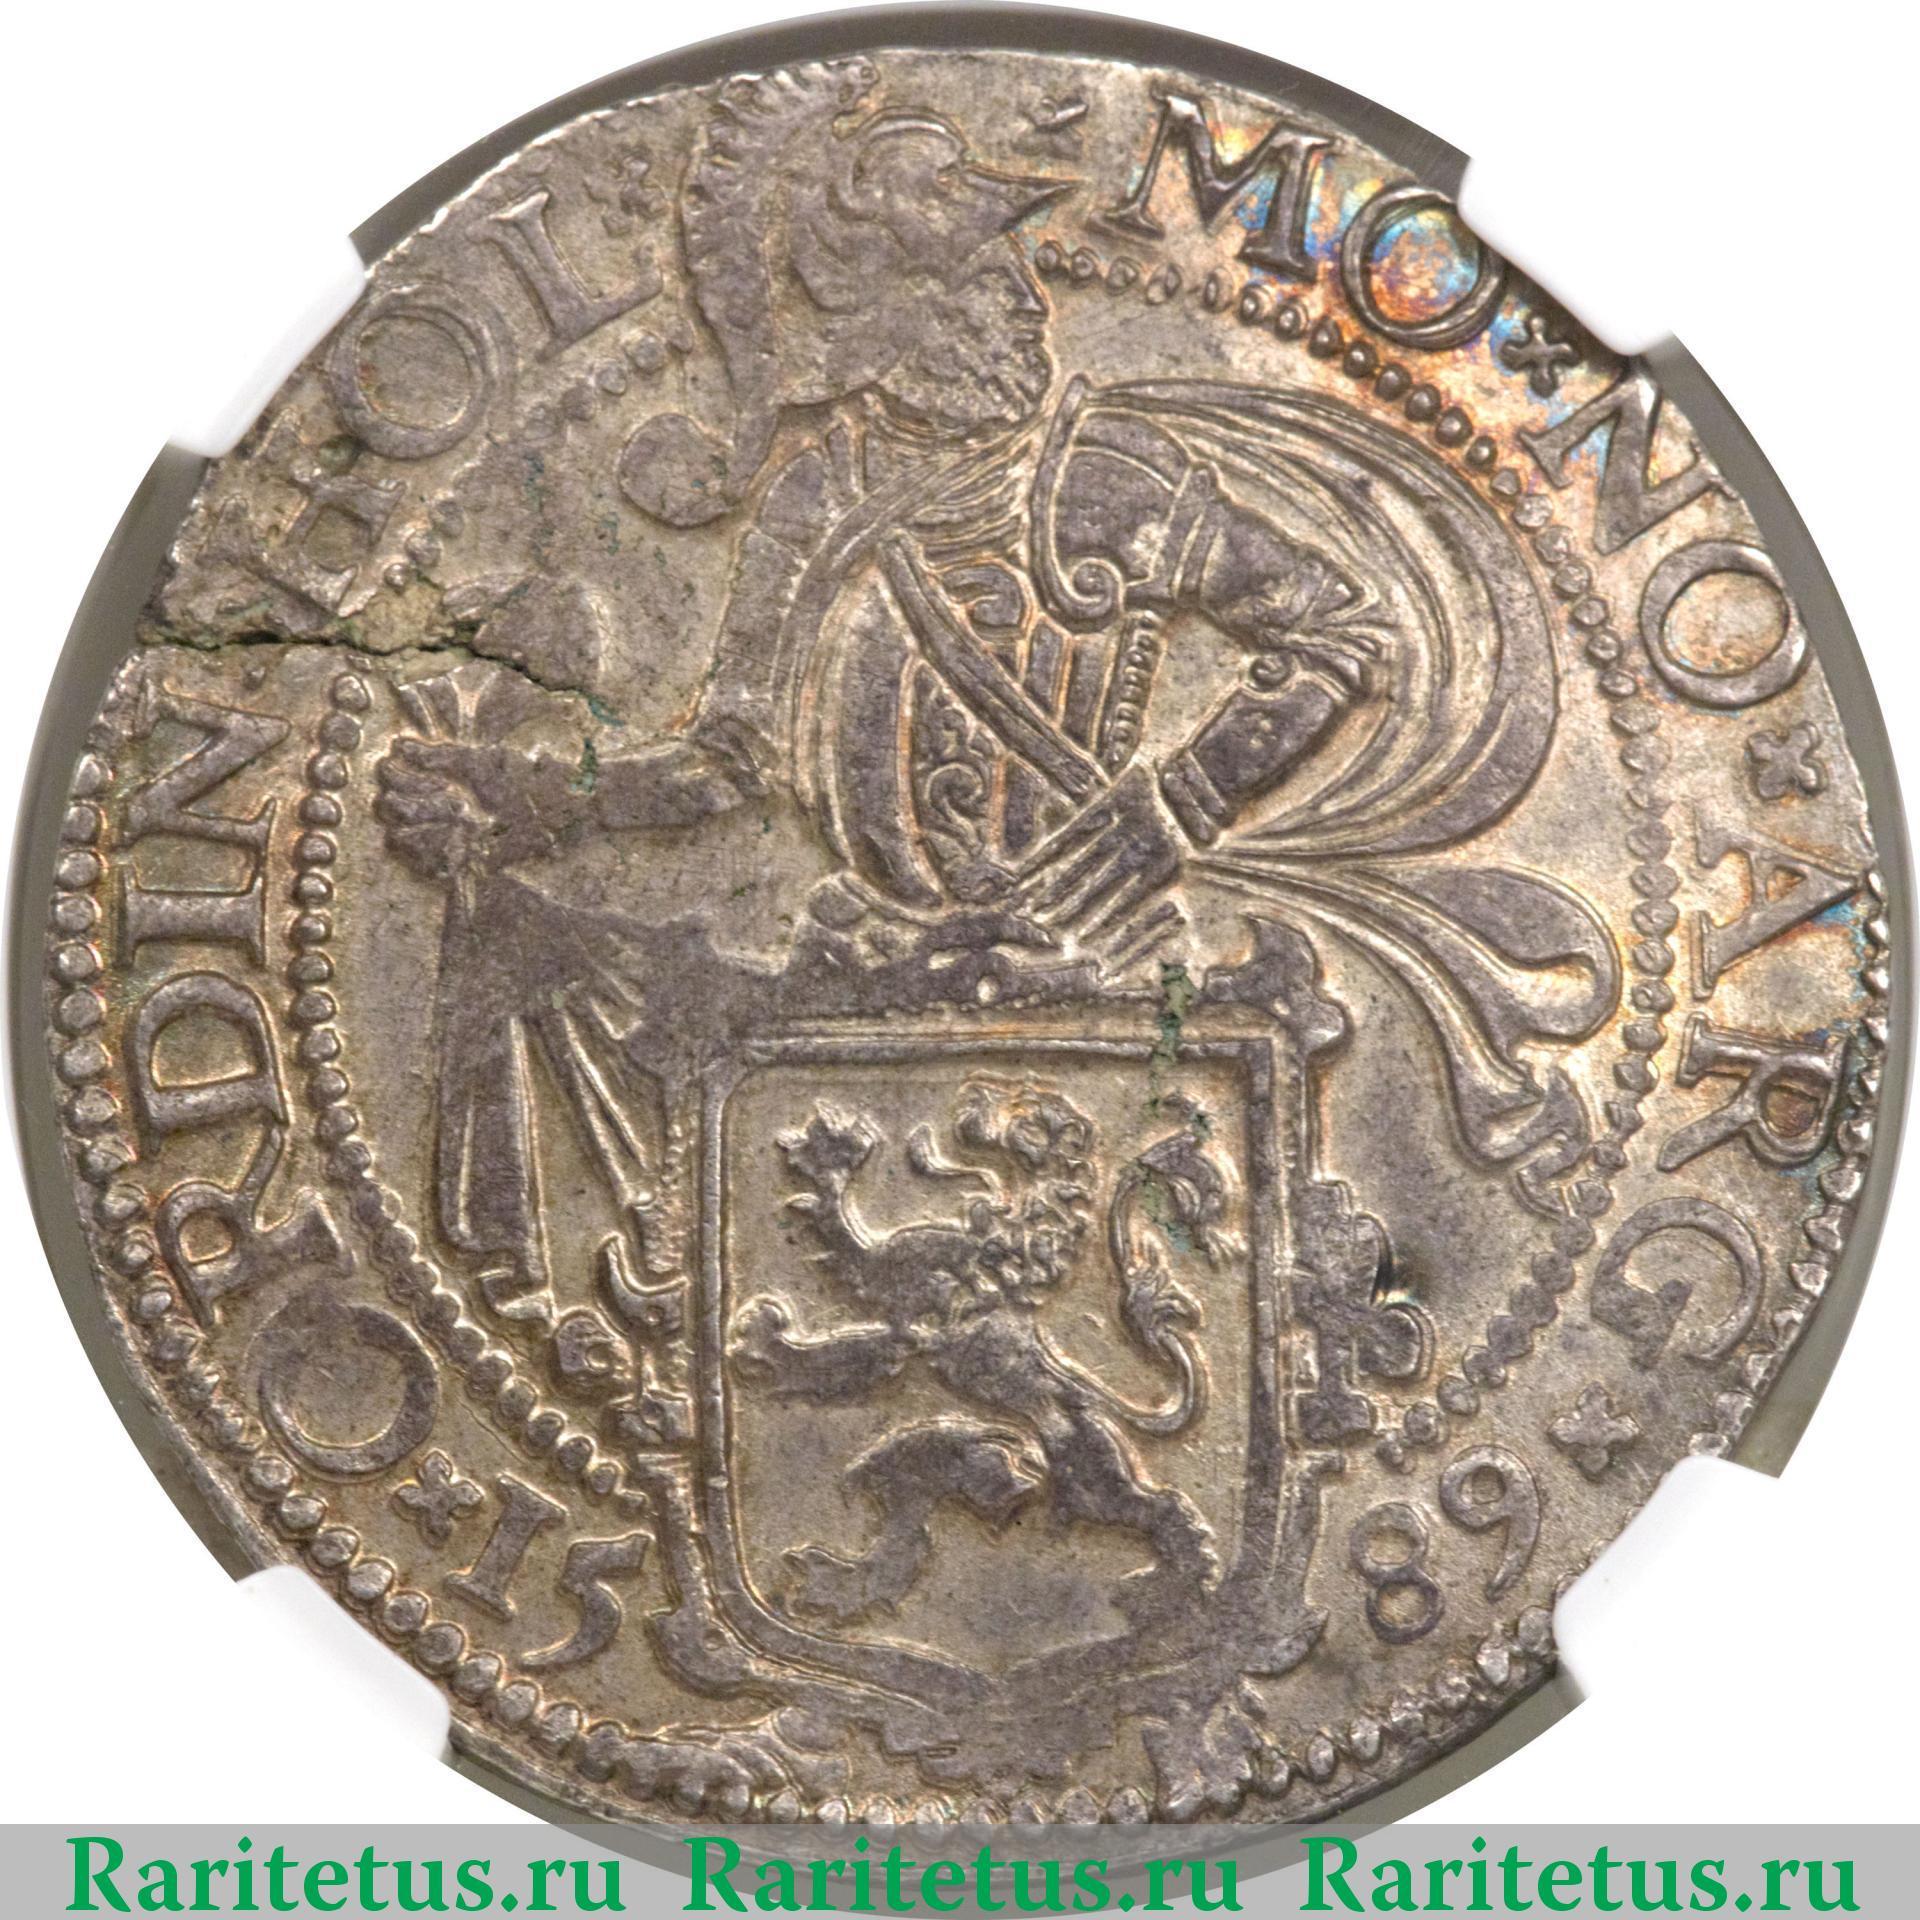 Аверс монеты даалдер (даальдер, дальдер, daalder) 1589 года